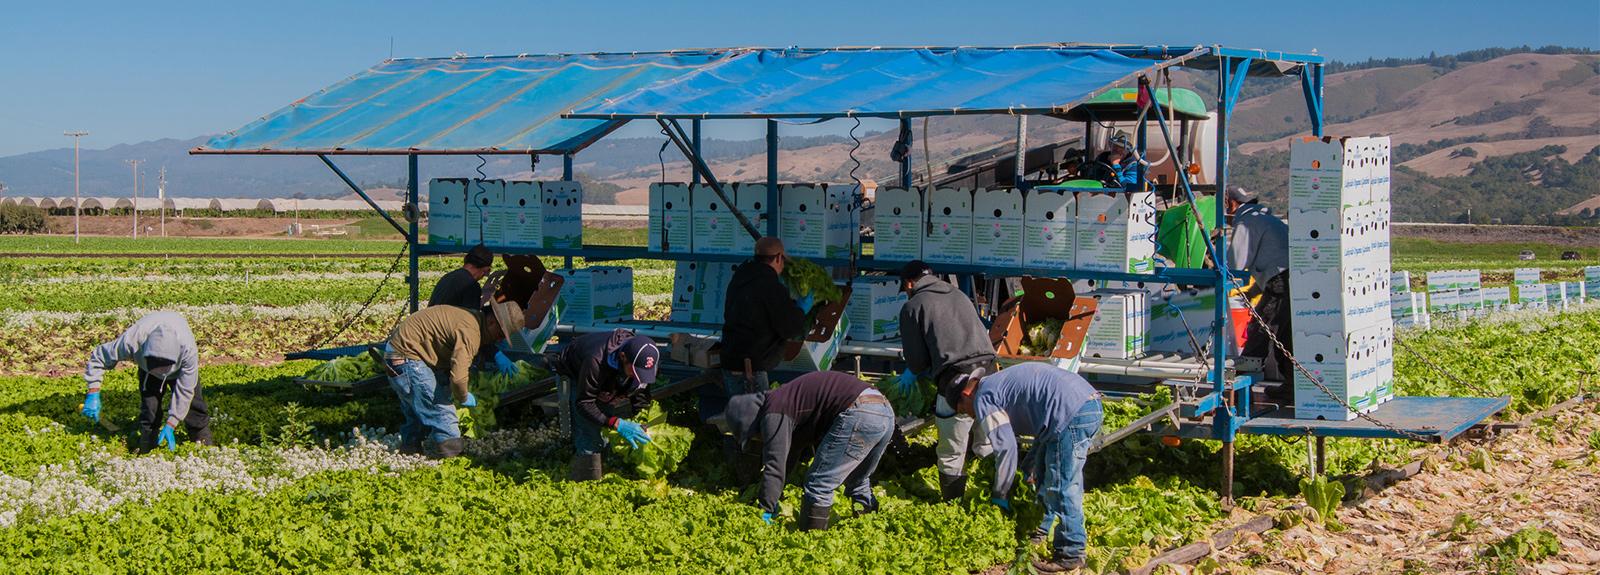 farmworkers harvest lettuce